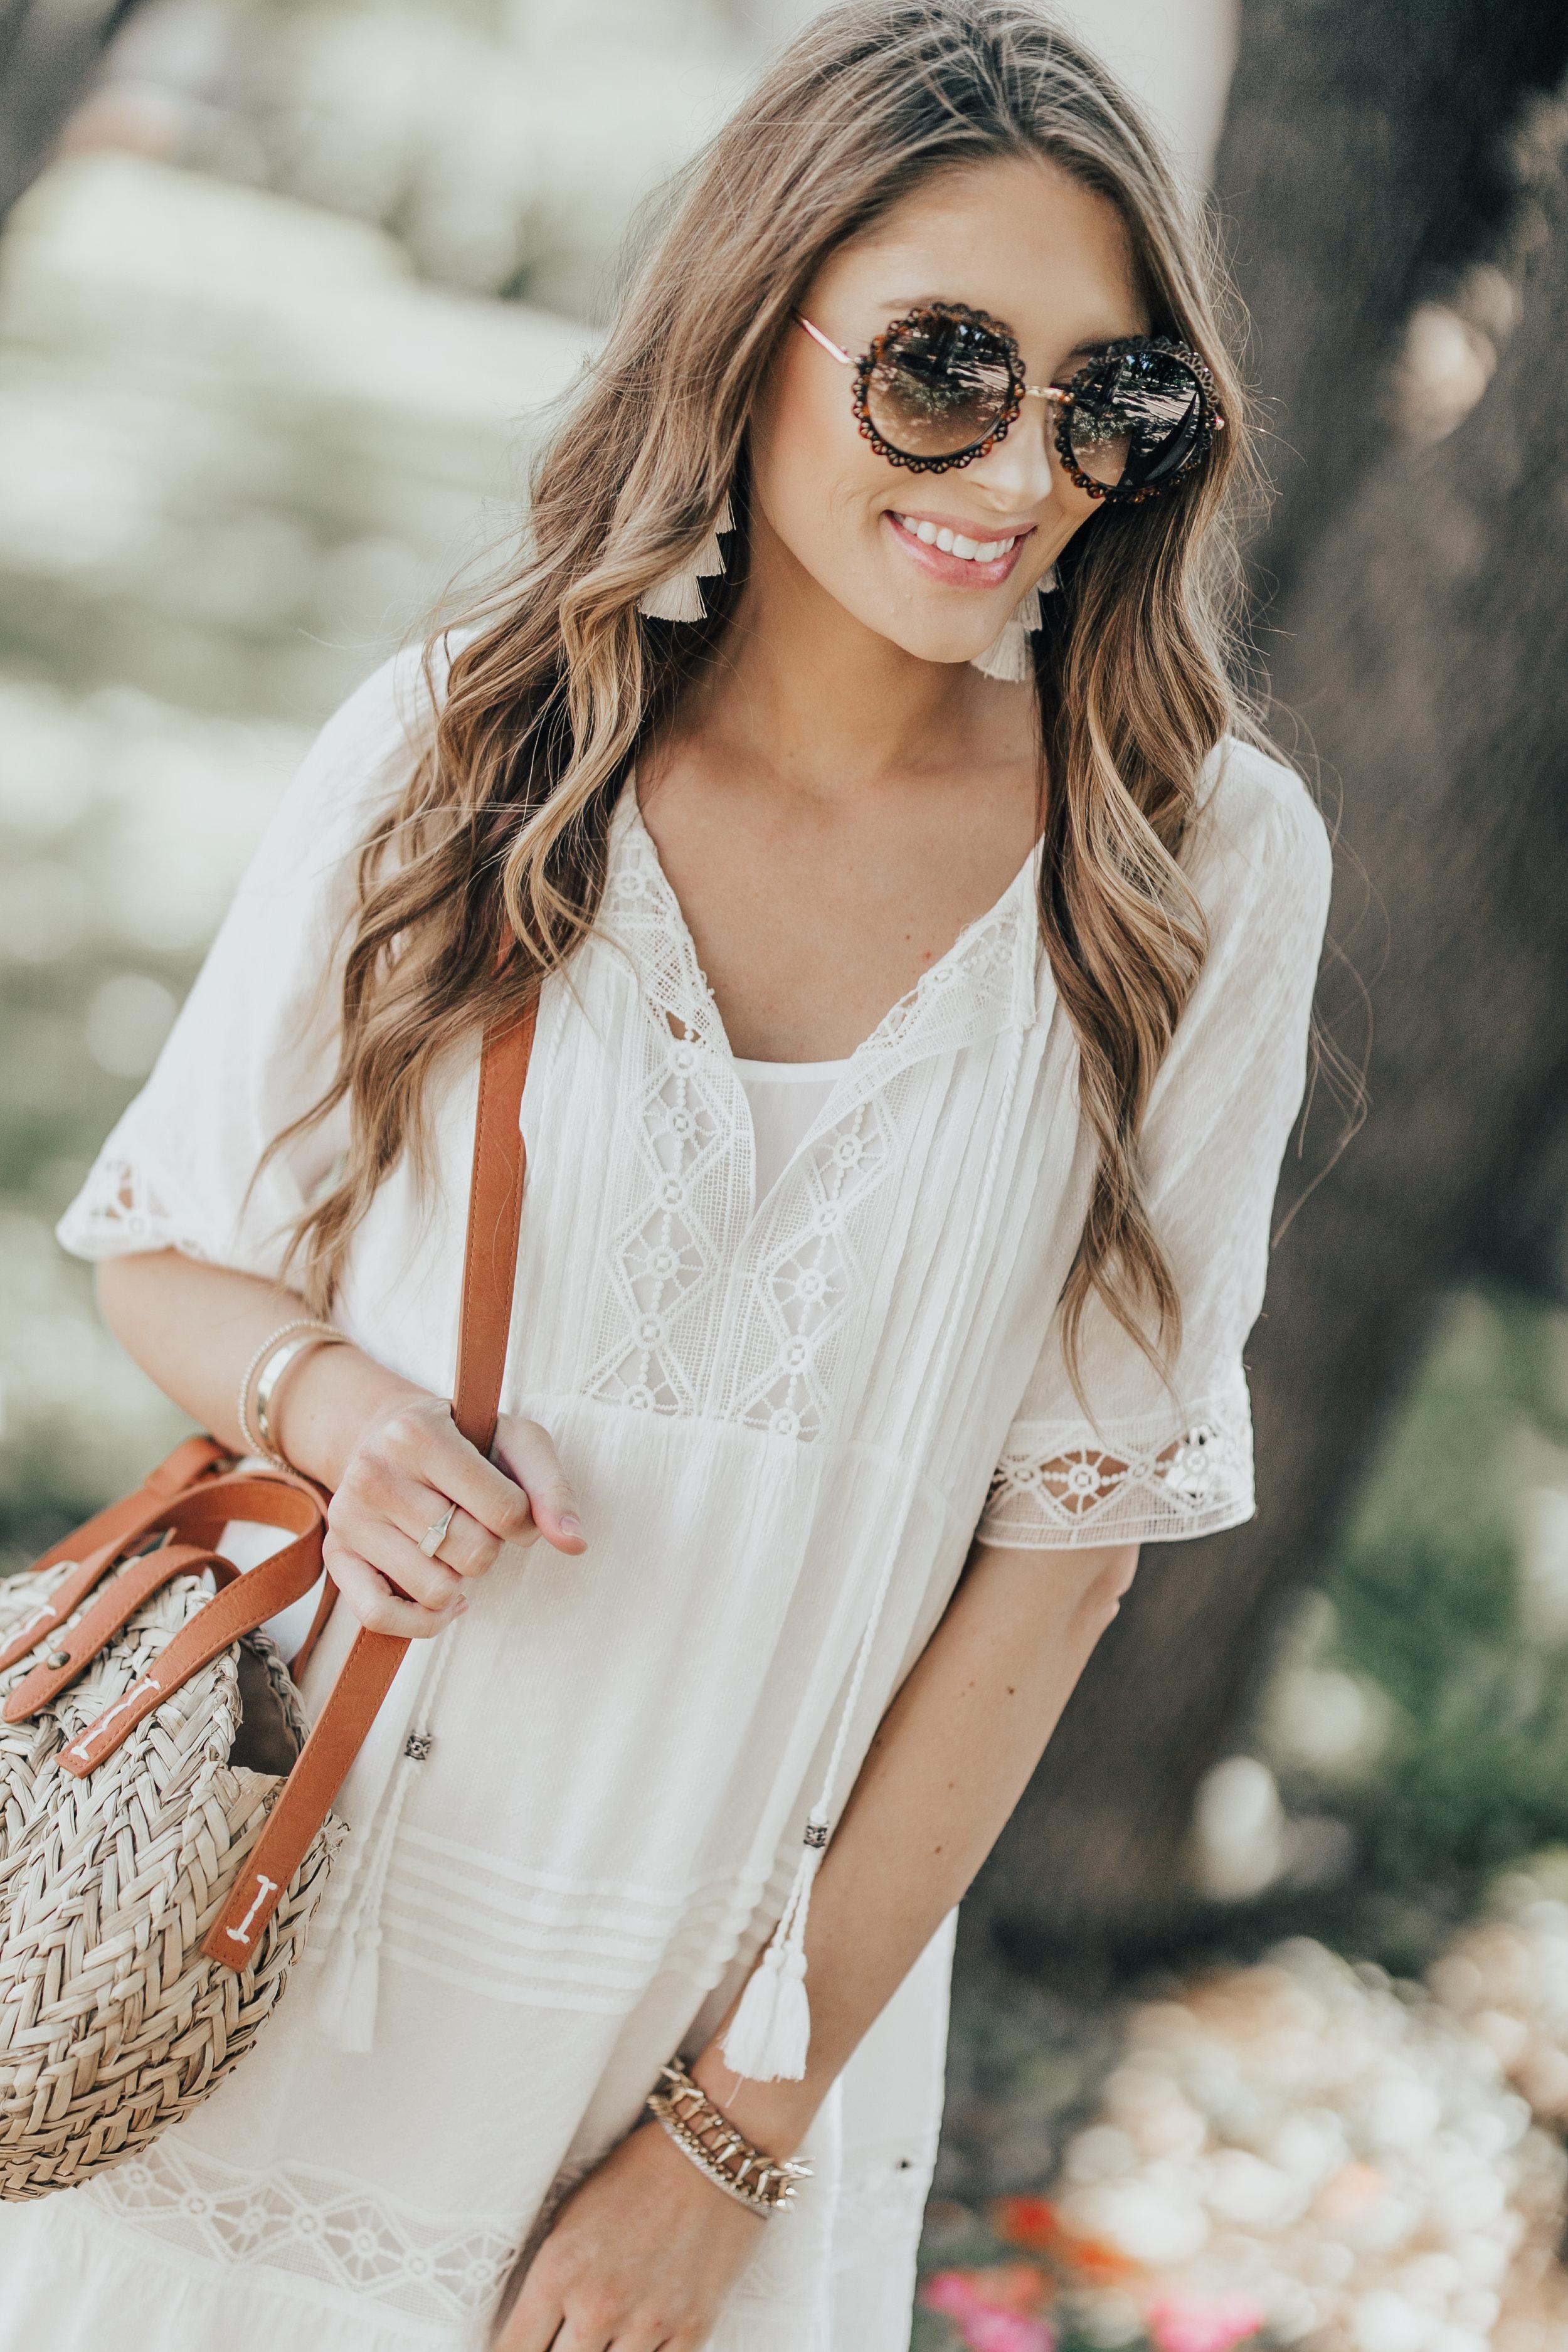 White Dress + Straw Bag